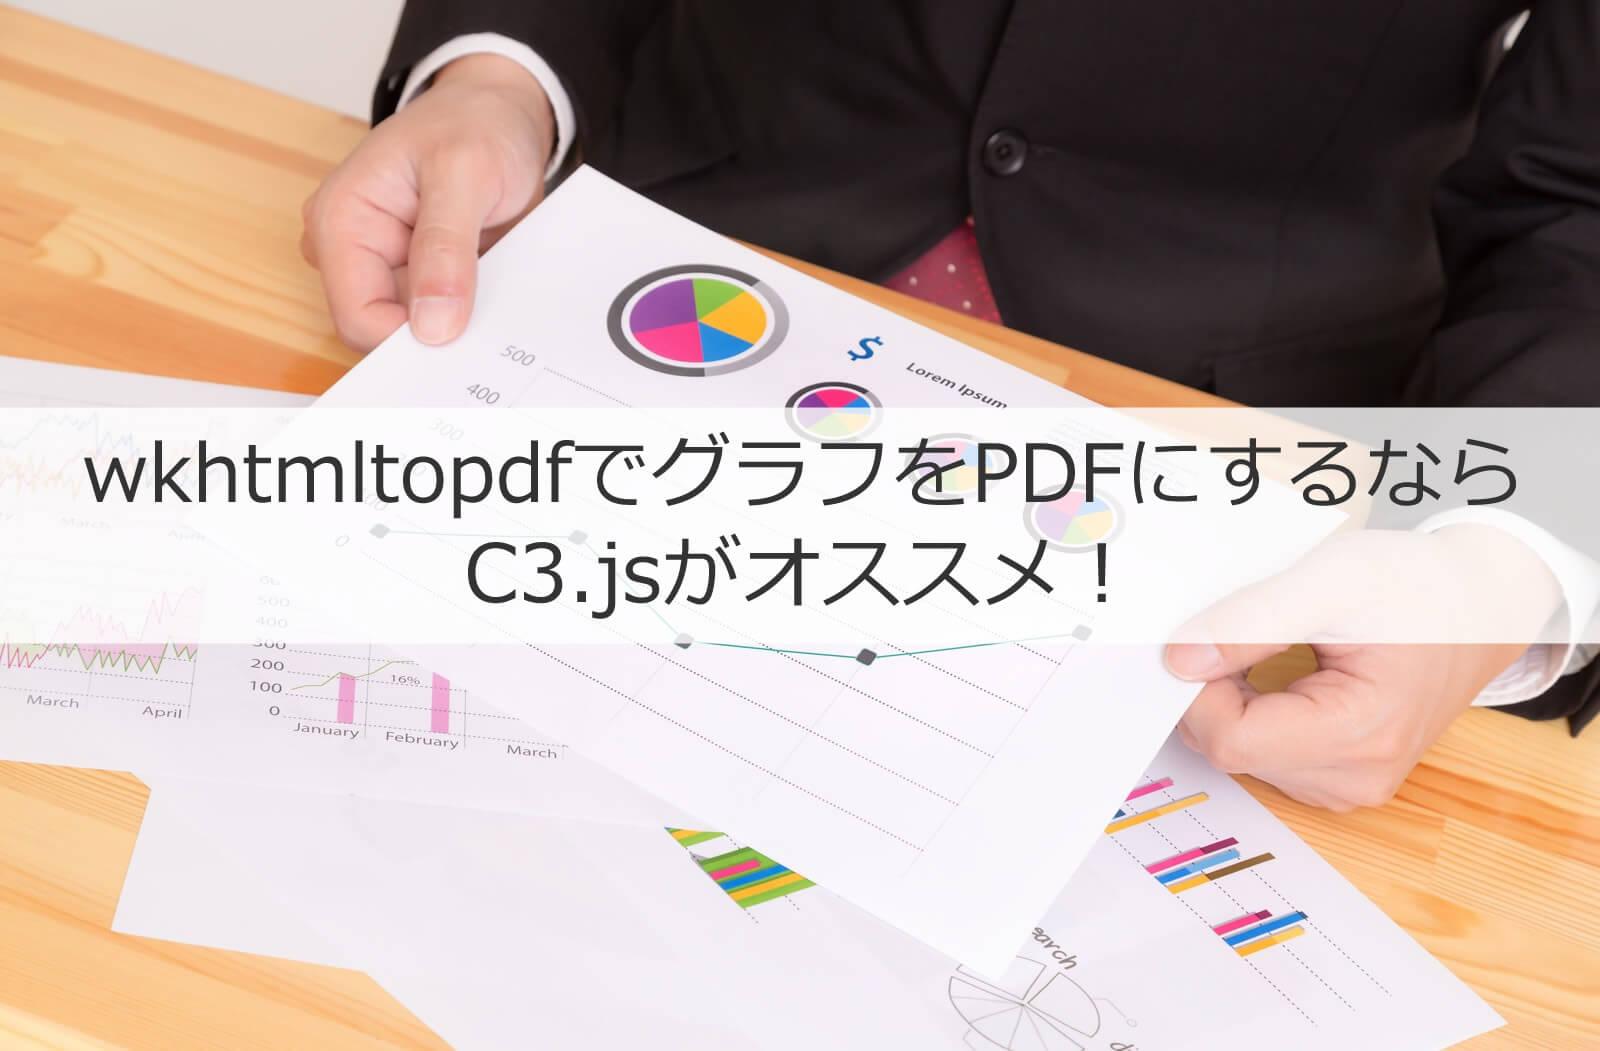 wkhtmltopdfでグラフをPDFにするならC3 jsがオススメ! | ProgramMemo